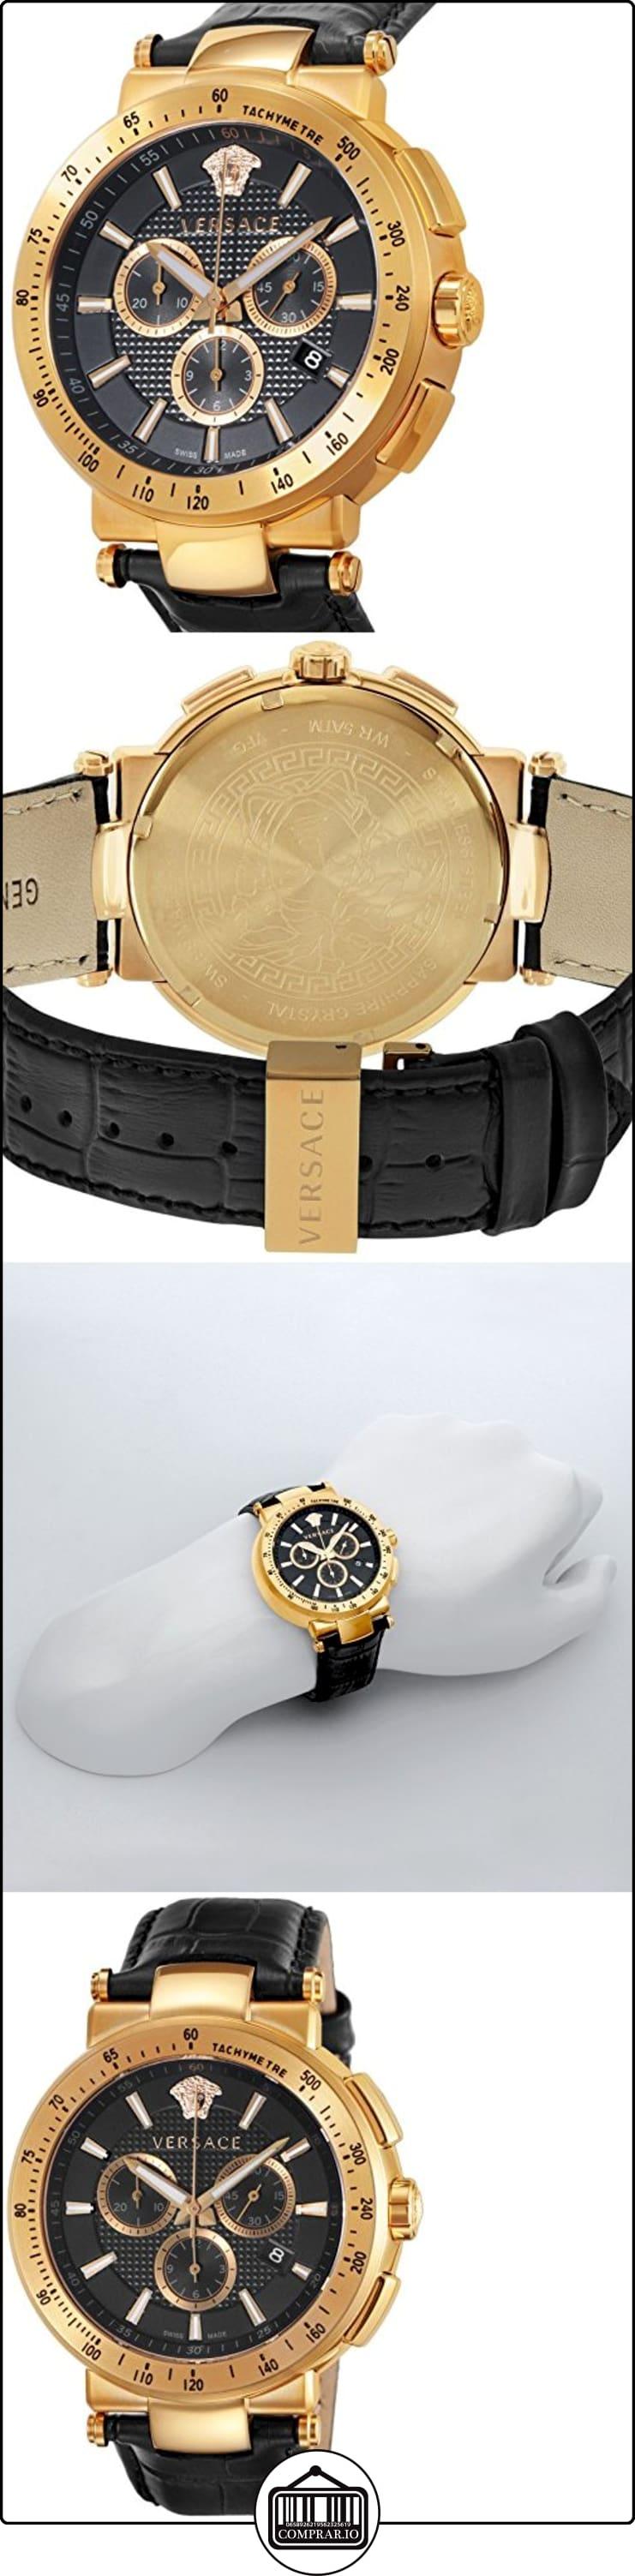 Versace vfg140016  ✿ Relojes para hombre - (Lujo) ✿